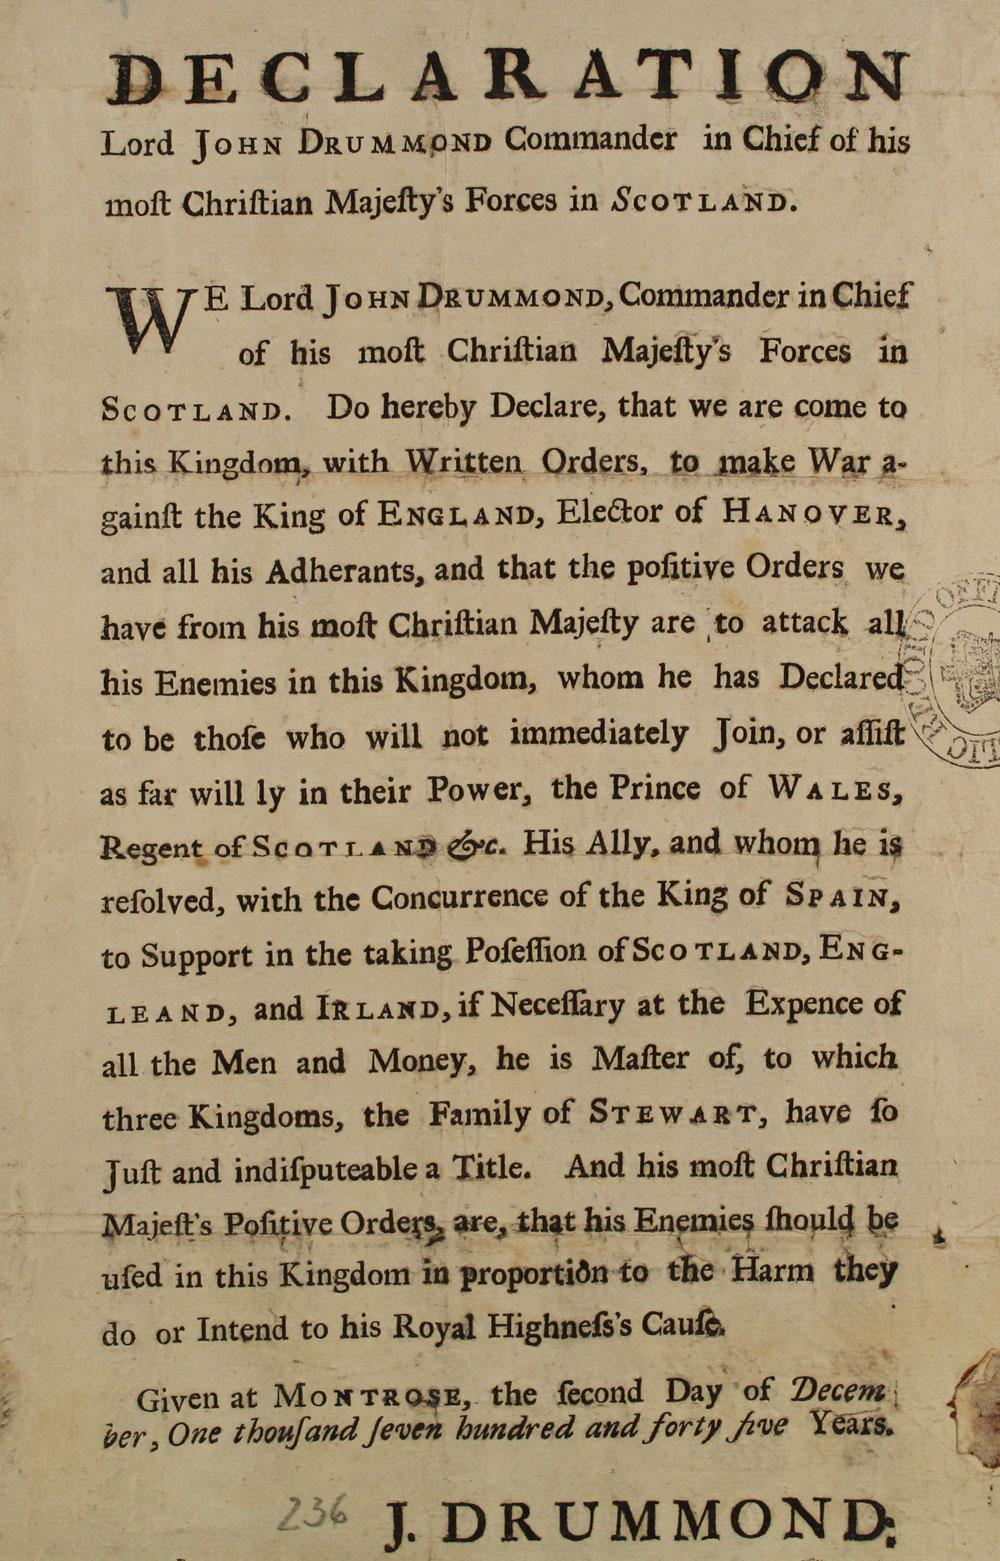 Printed handbill from Lord John Drummond, 1745 (SP 54/26/90B)